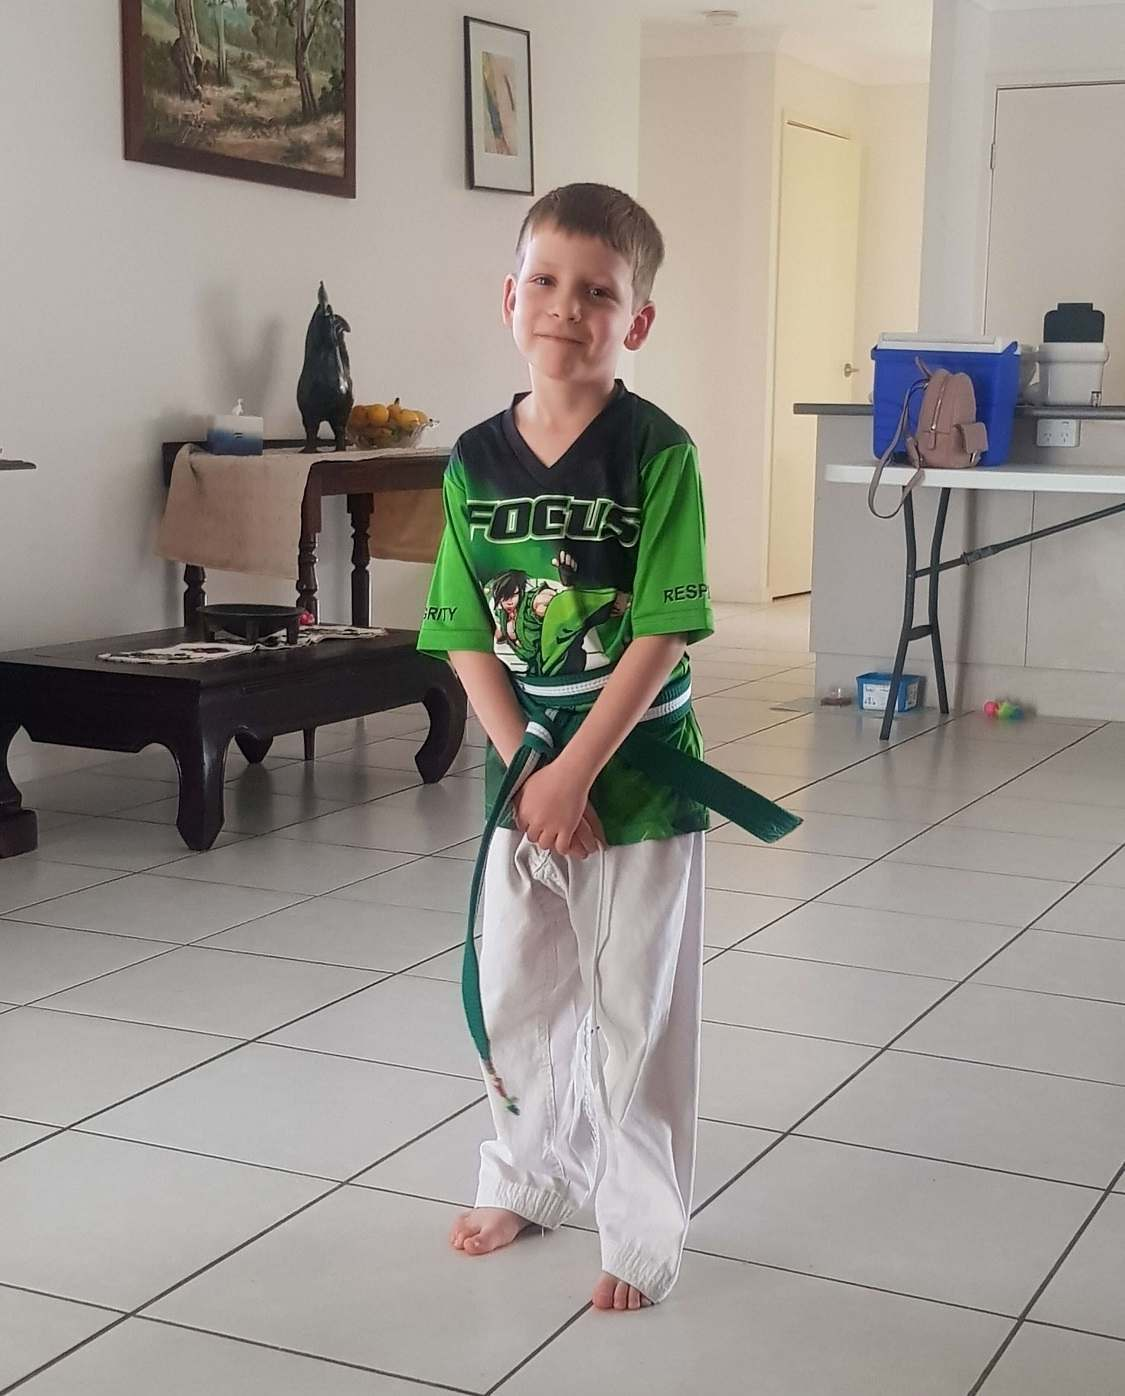 Webp.net Resizeimage 2, Excel Taekwondo Littleton CO